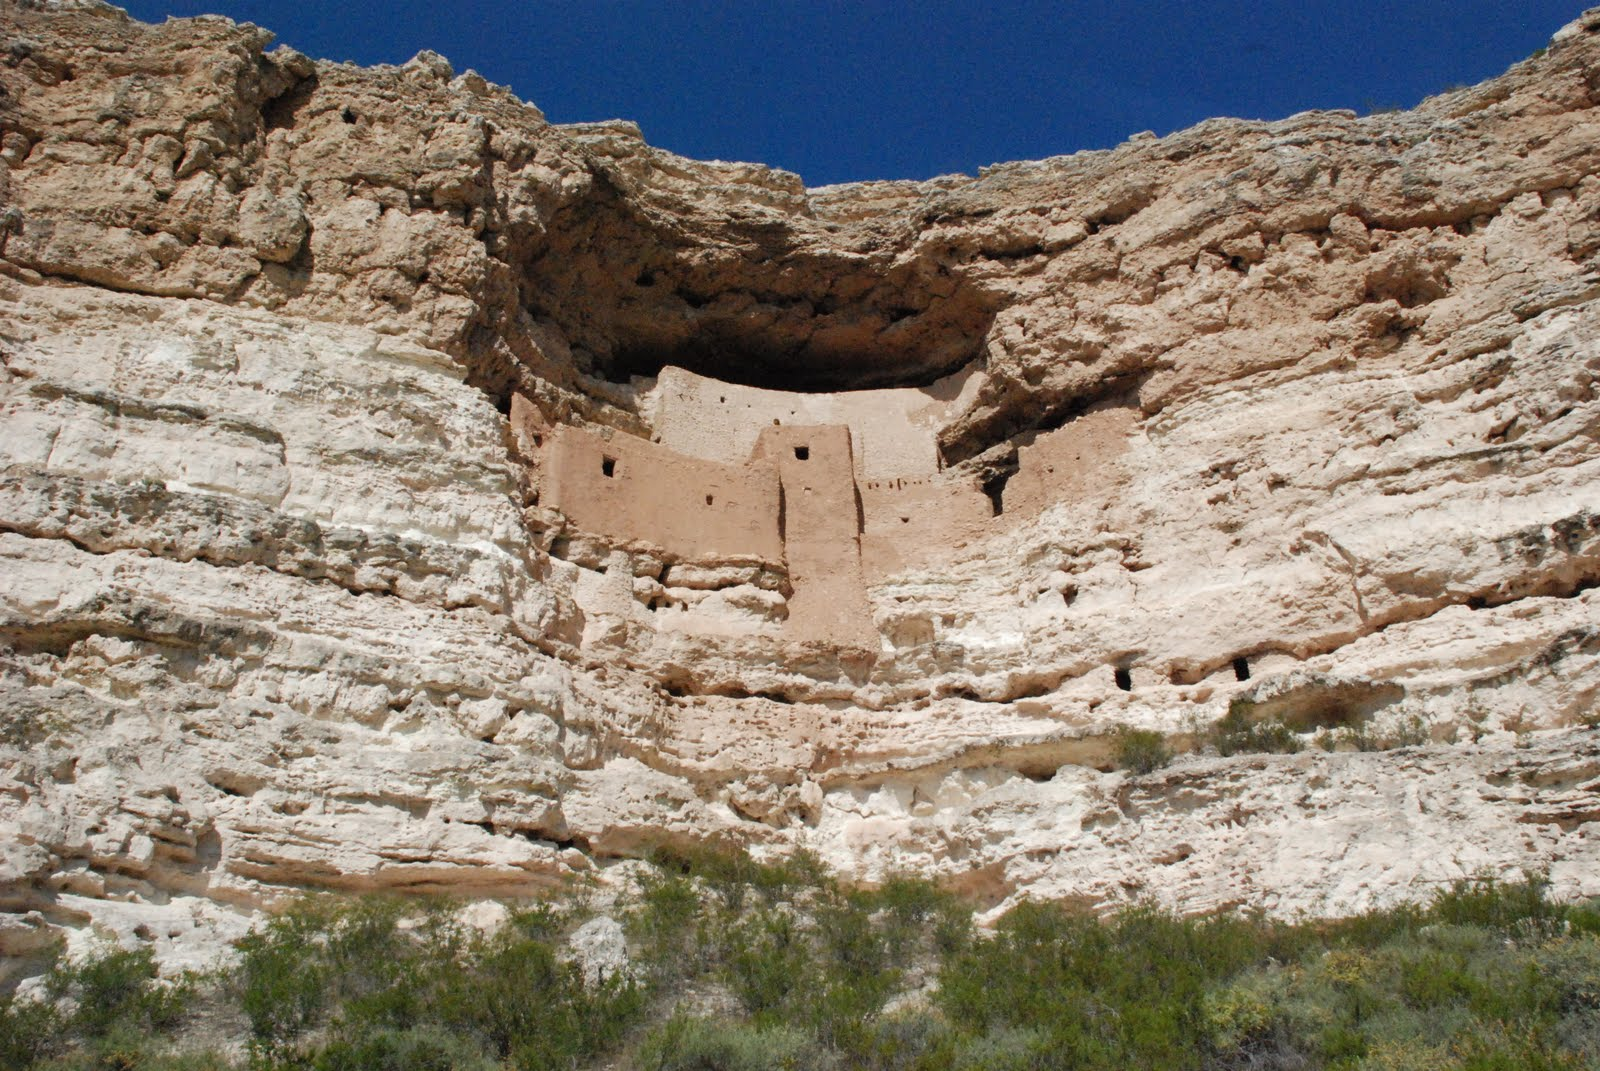 montezuma castle Arizona's montezuma castle national monument, a sinagua cliff house includes montezuma well and photos, climate, history, hiking, with links & mileage guides to.